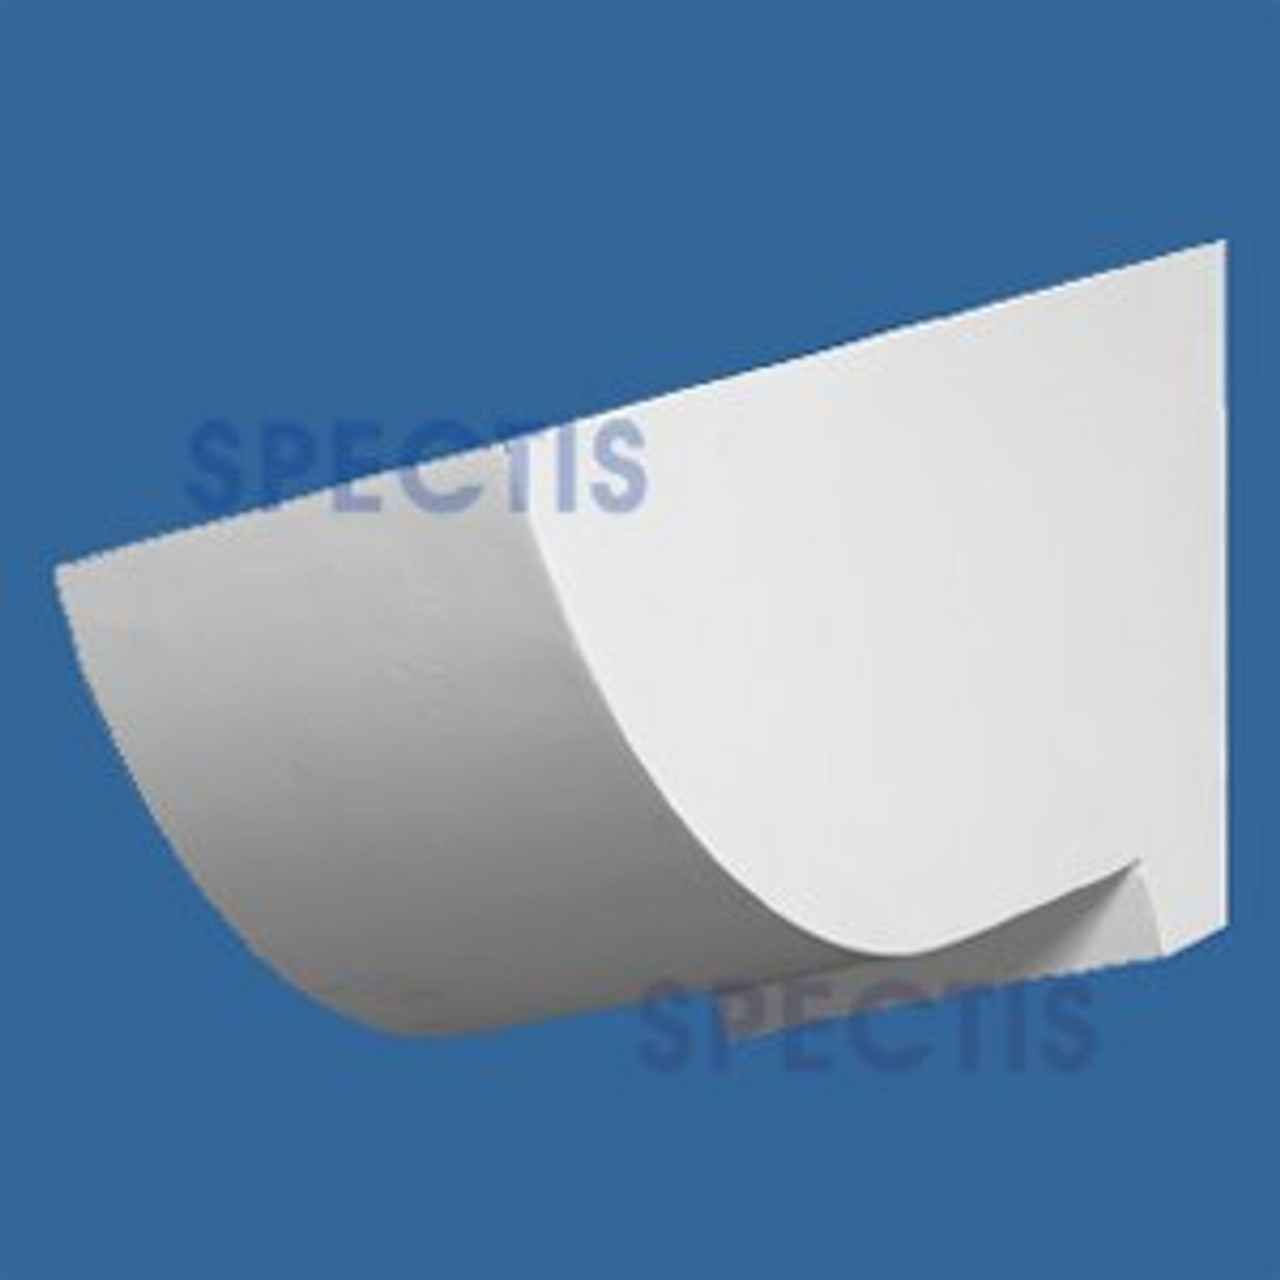 "BL2766 Corbel Block or Eave Bracket 5""W x 6.5""H x 14.5"" P"